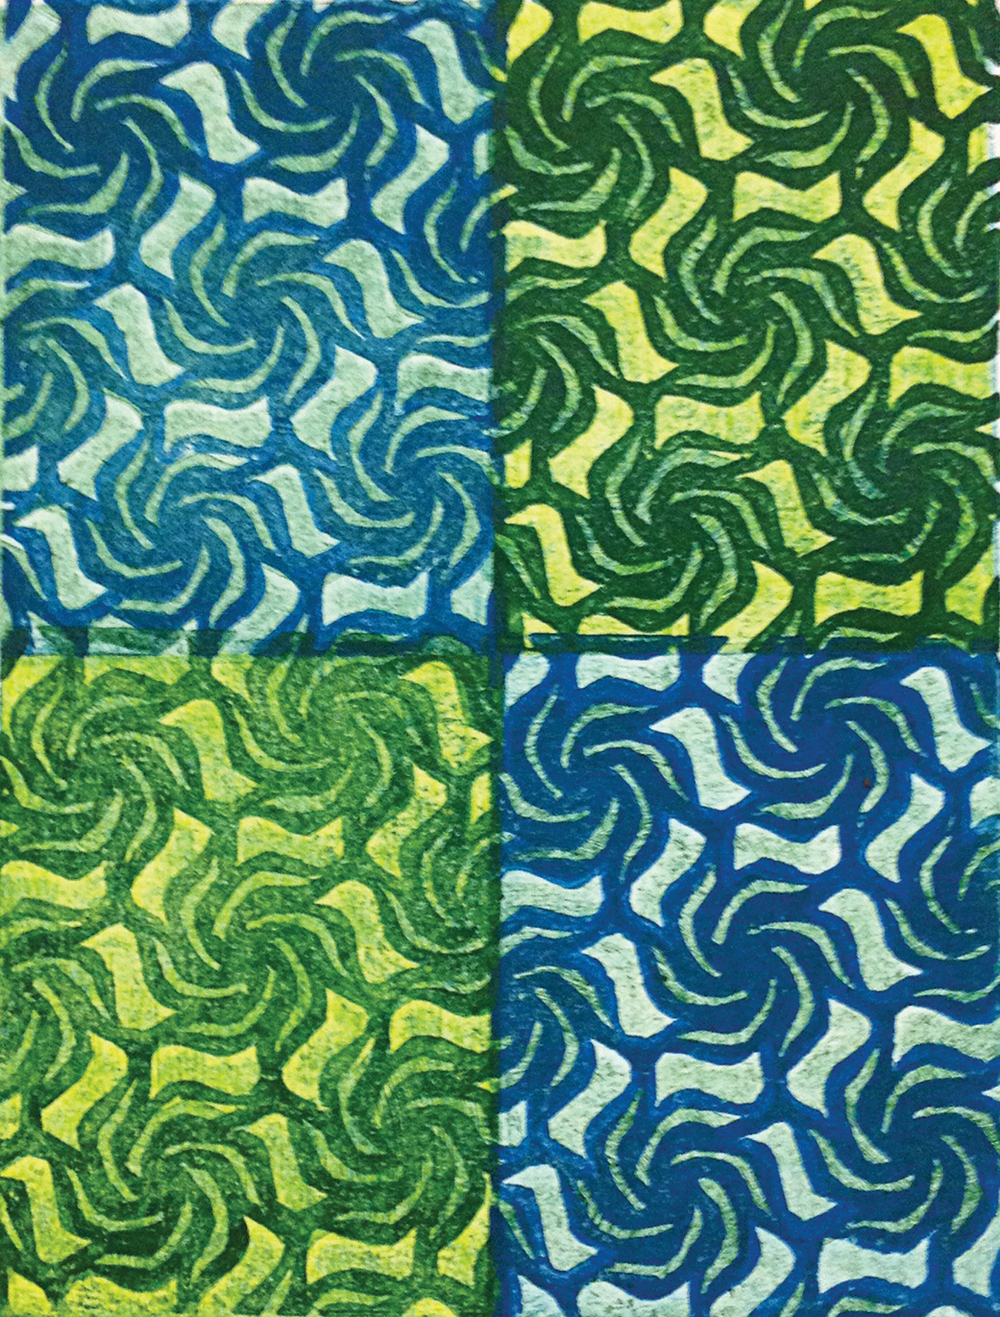 Pattern I, Composite